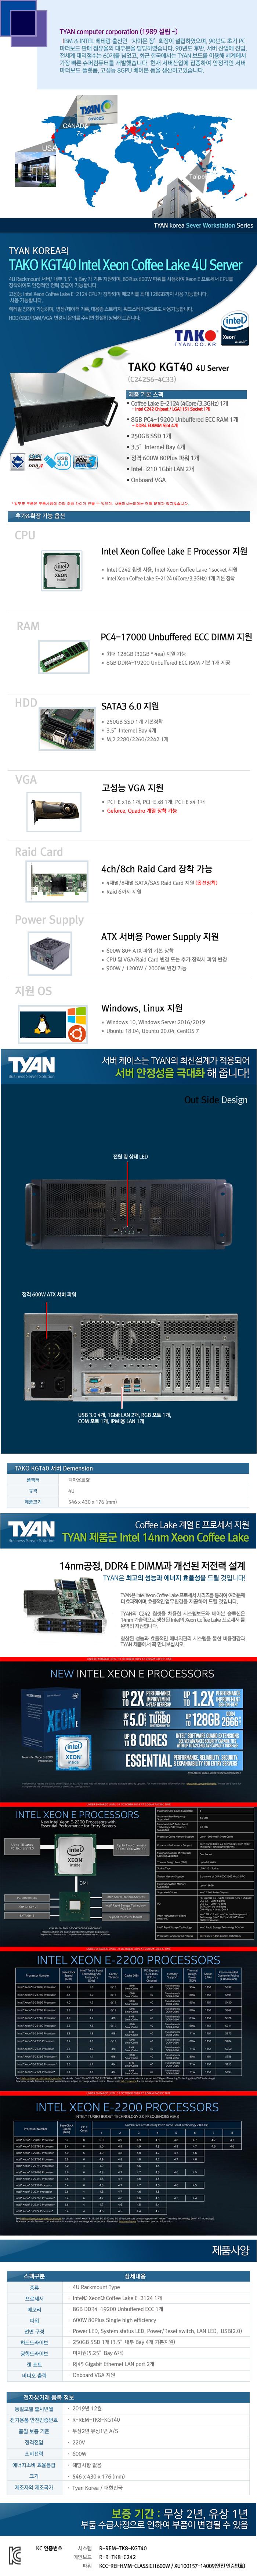 TYAN TAKO-KGT40-(C242S6-4C33) (8GB, SSD 250GB)